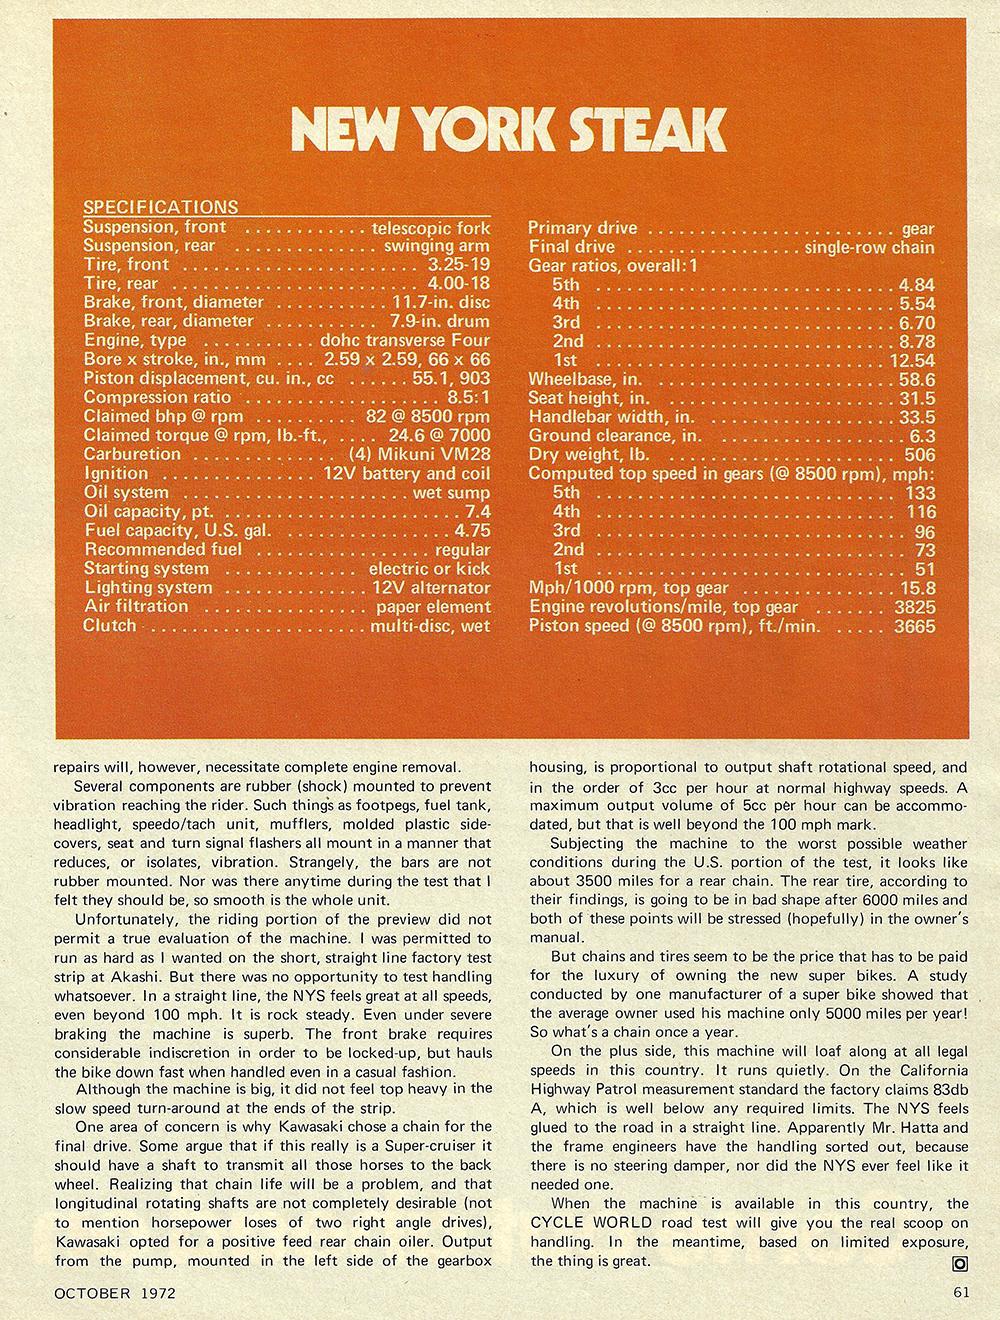 1972 Kawasaki Z1 900 New York Steak road test 06.jpg